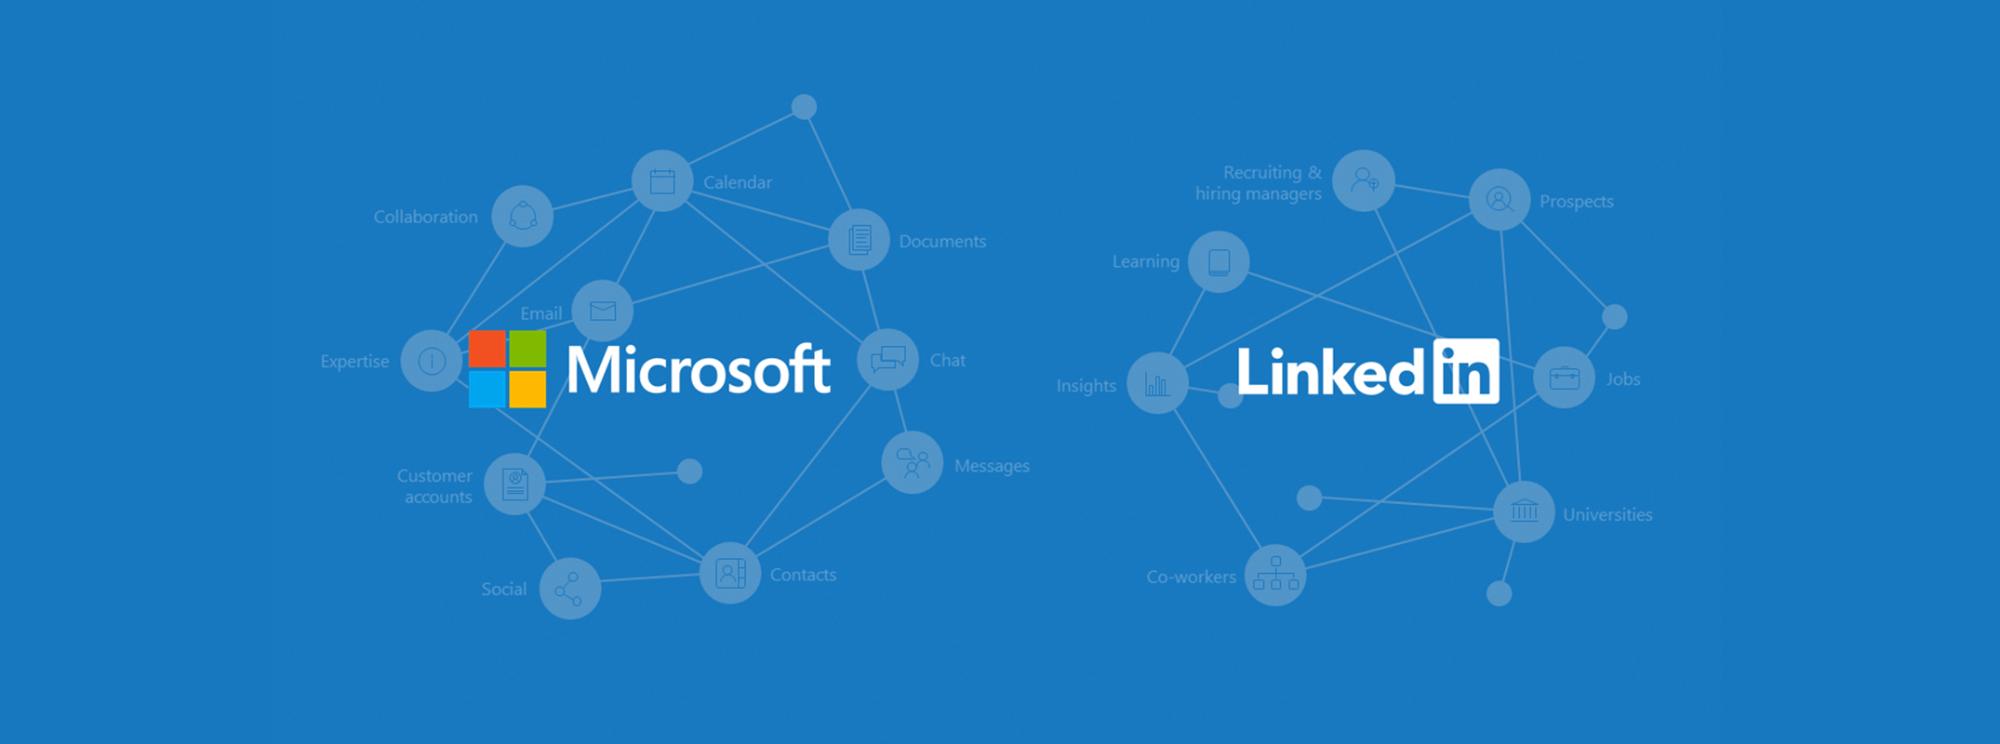 Microsoft, LinkedIn